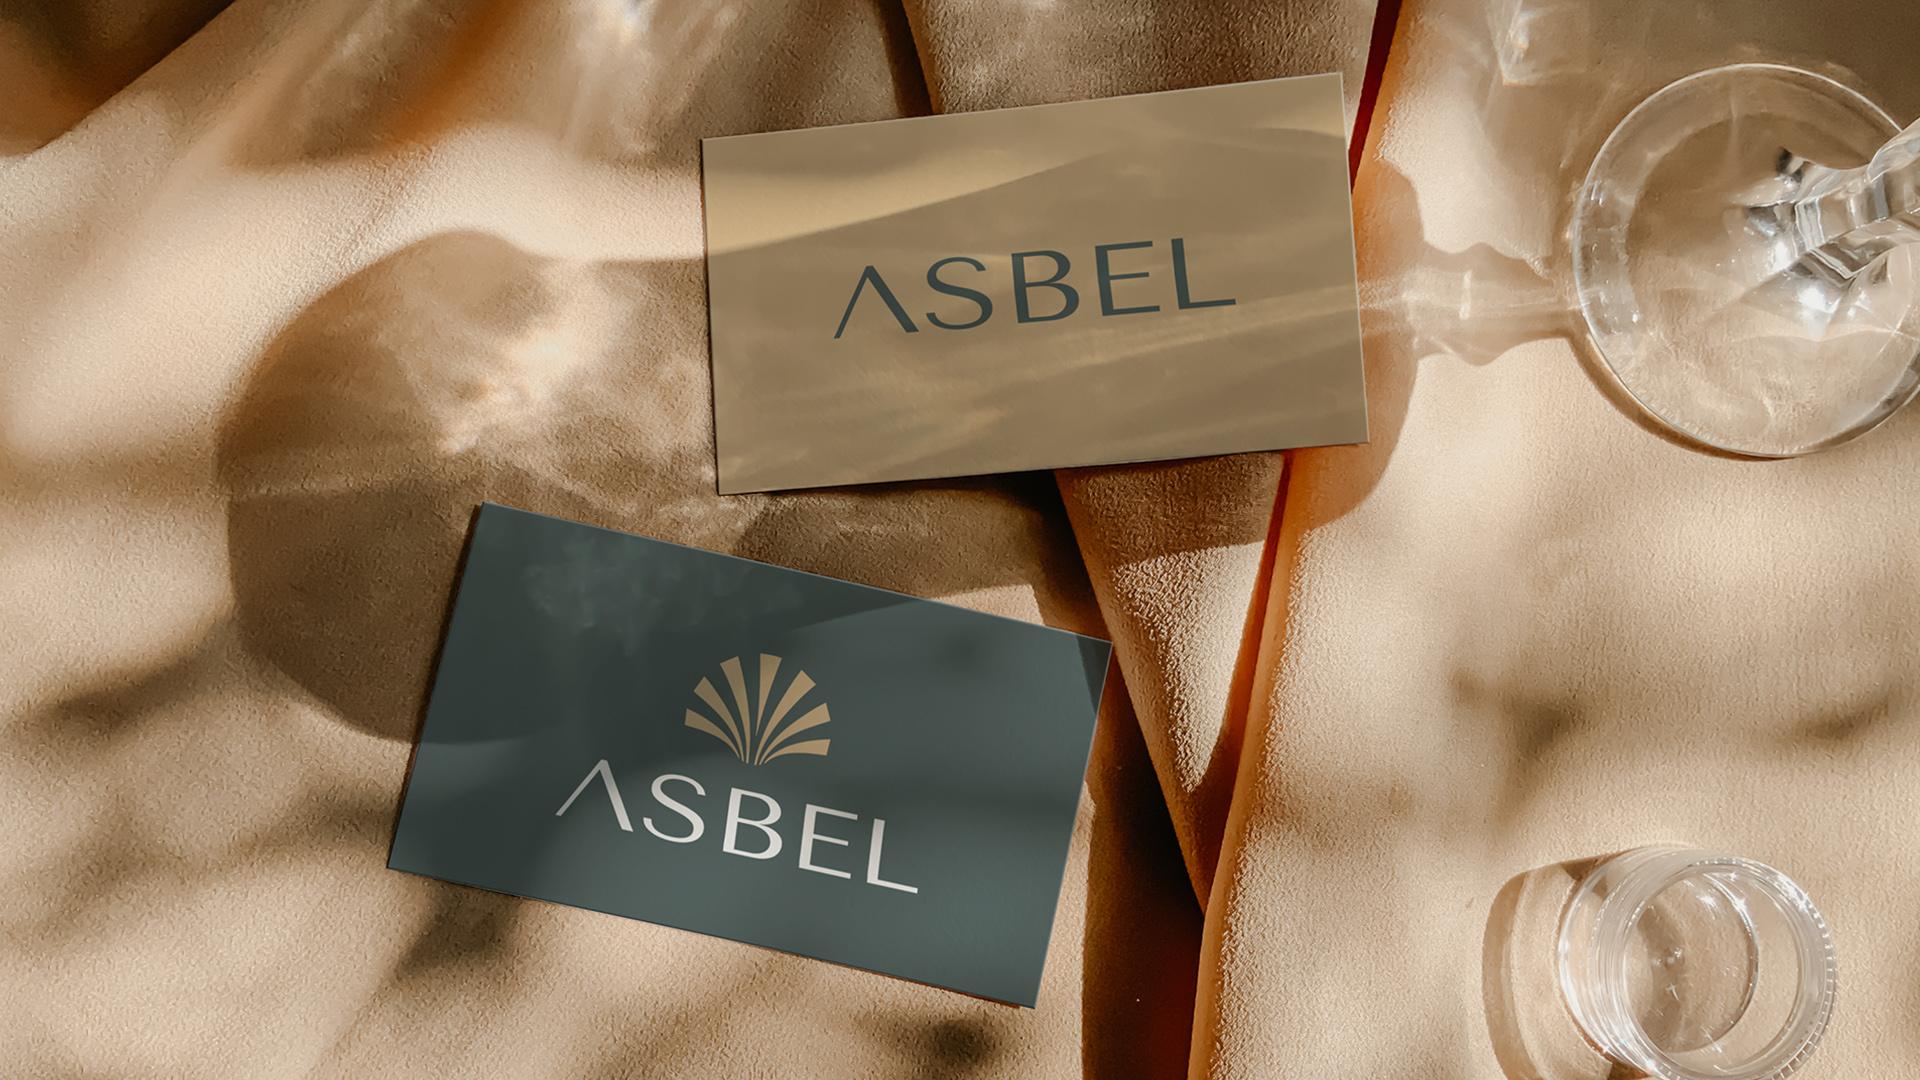 Asbel Brand identity Design by Aya Magdy